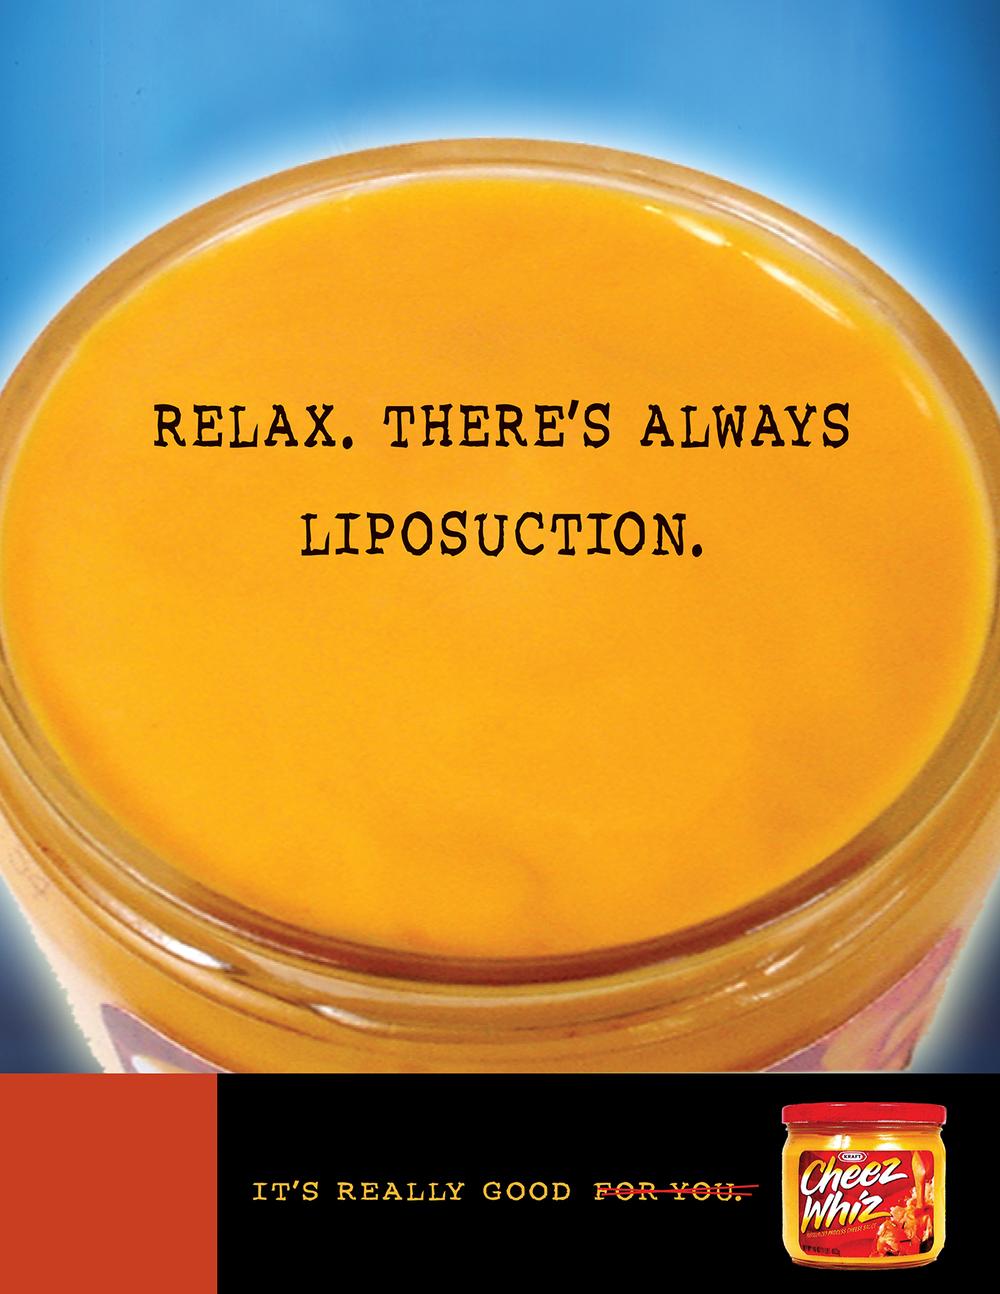 CW_liposuction_(1275x1650@150dpi).jpg